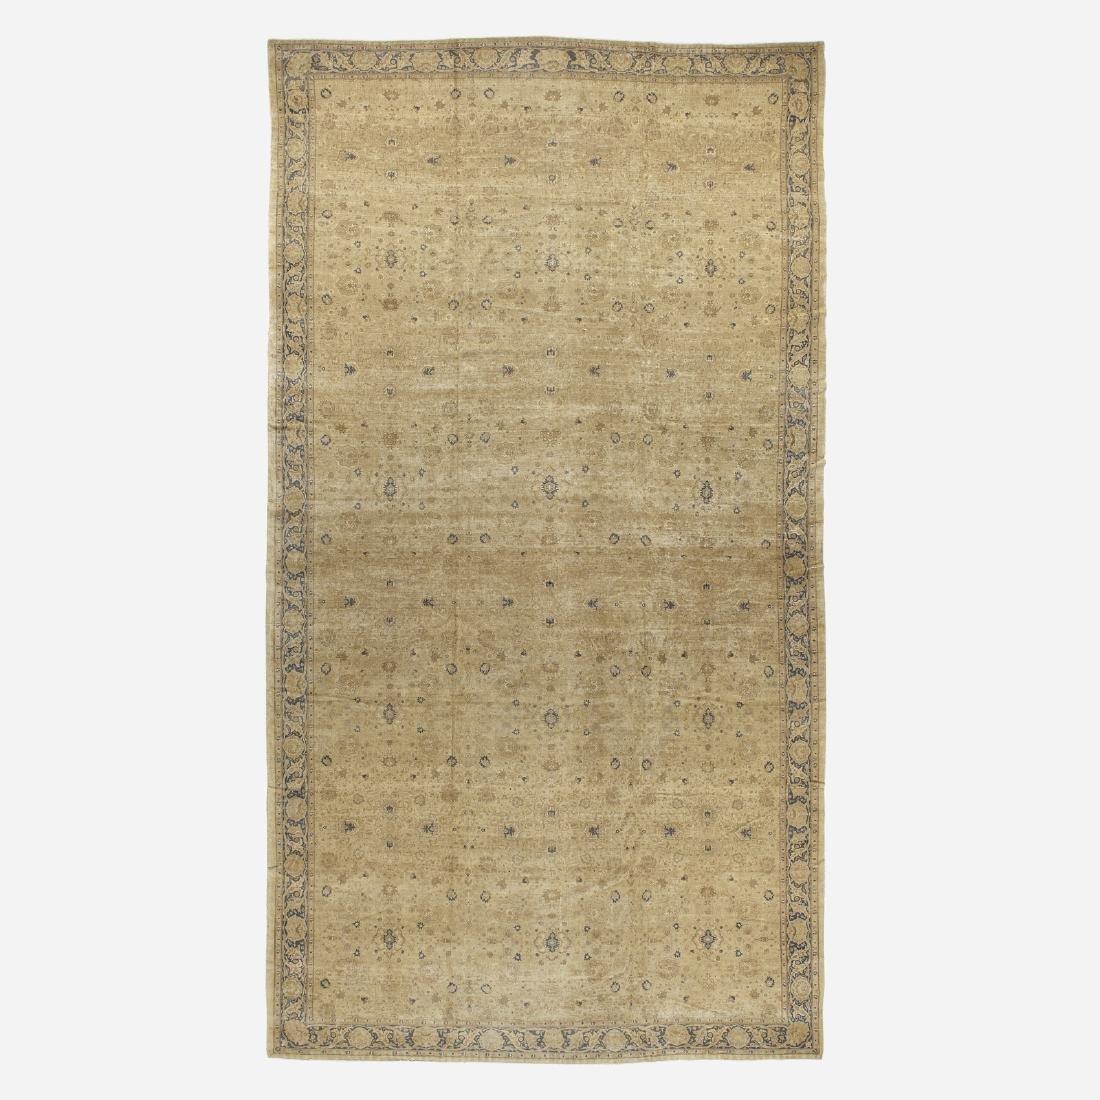 Turkish, Monumental Sivas carpet